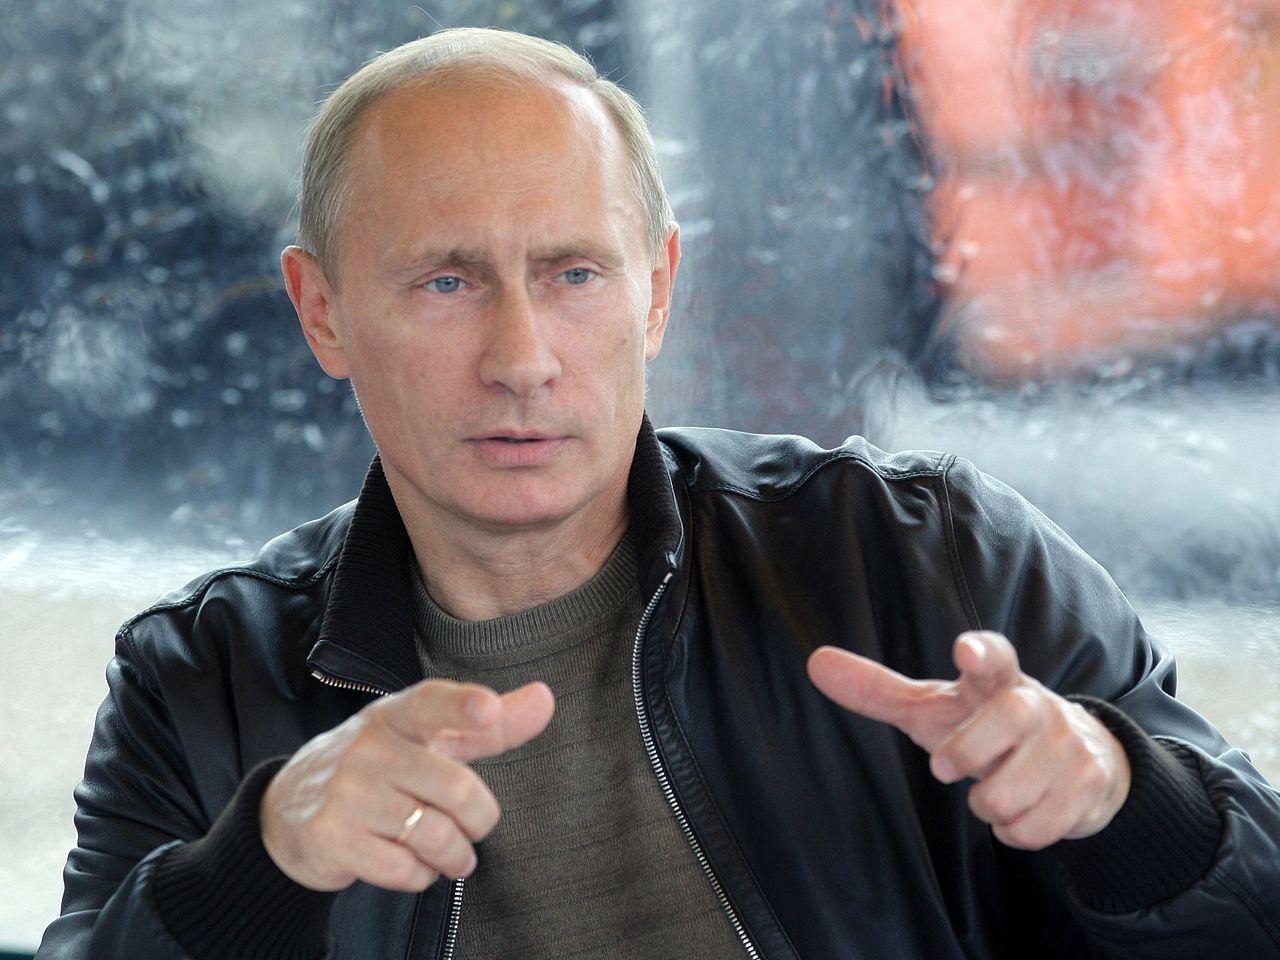 Putin: Ryssland måste bygga ett eget internet